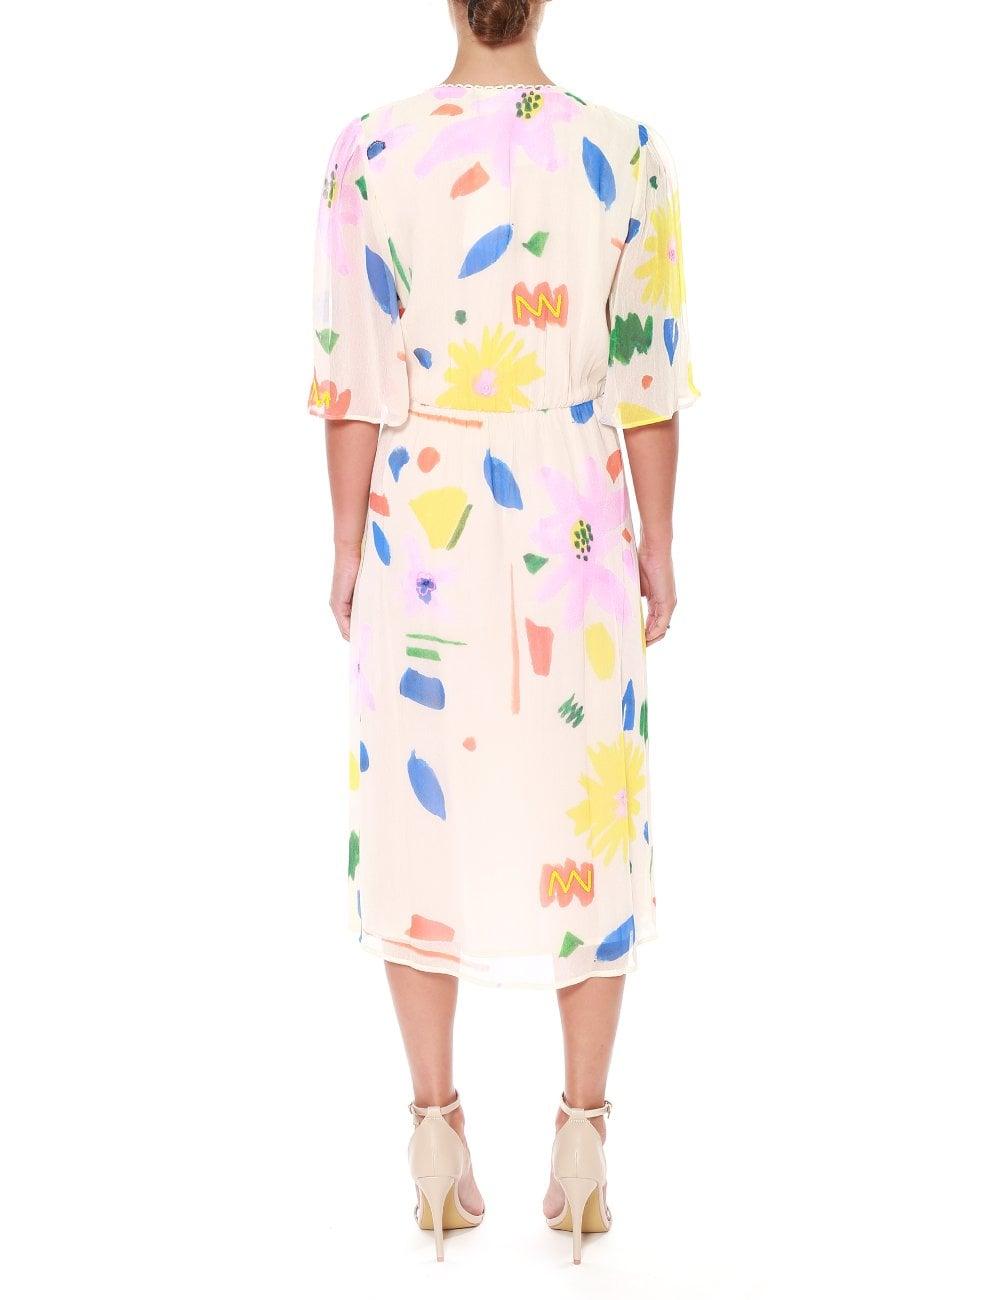 84e141660472c WOMENS AUDREY PRINTED & EMBELLISHED MAXI DRESS